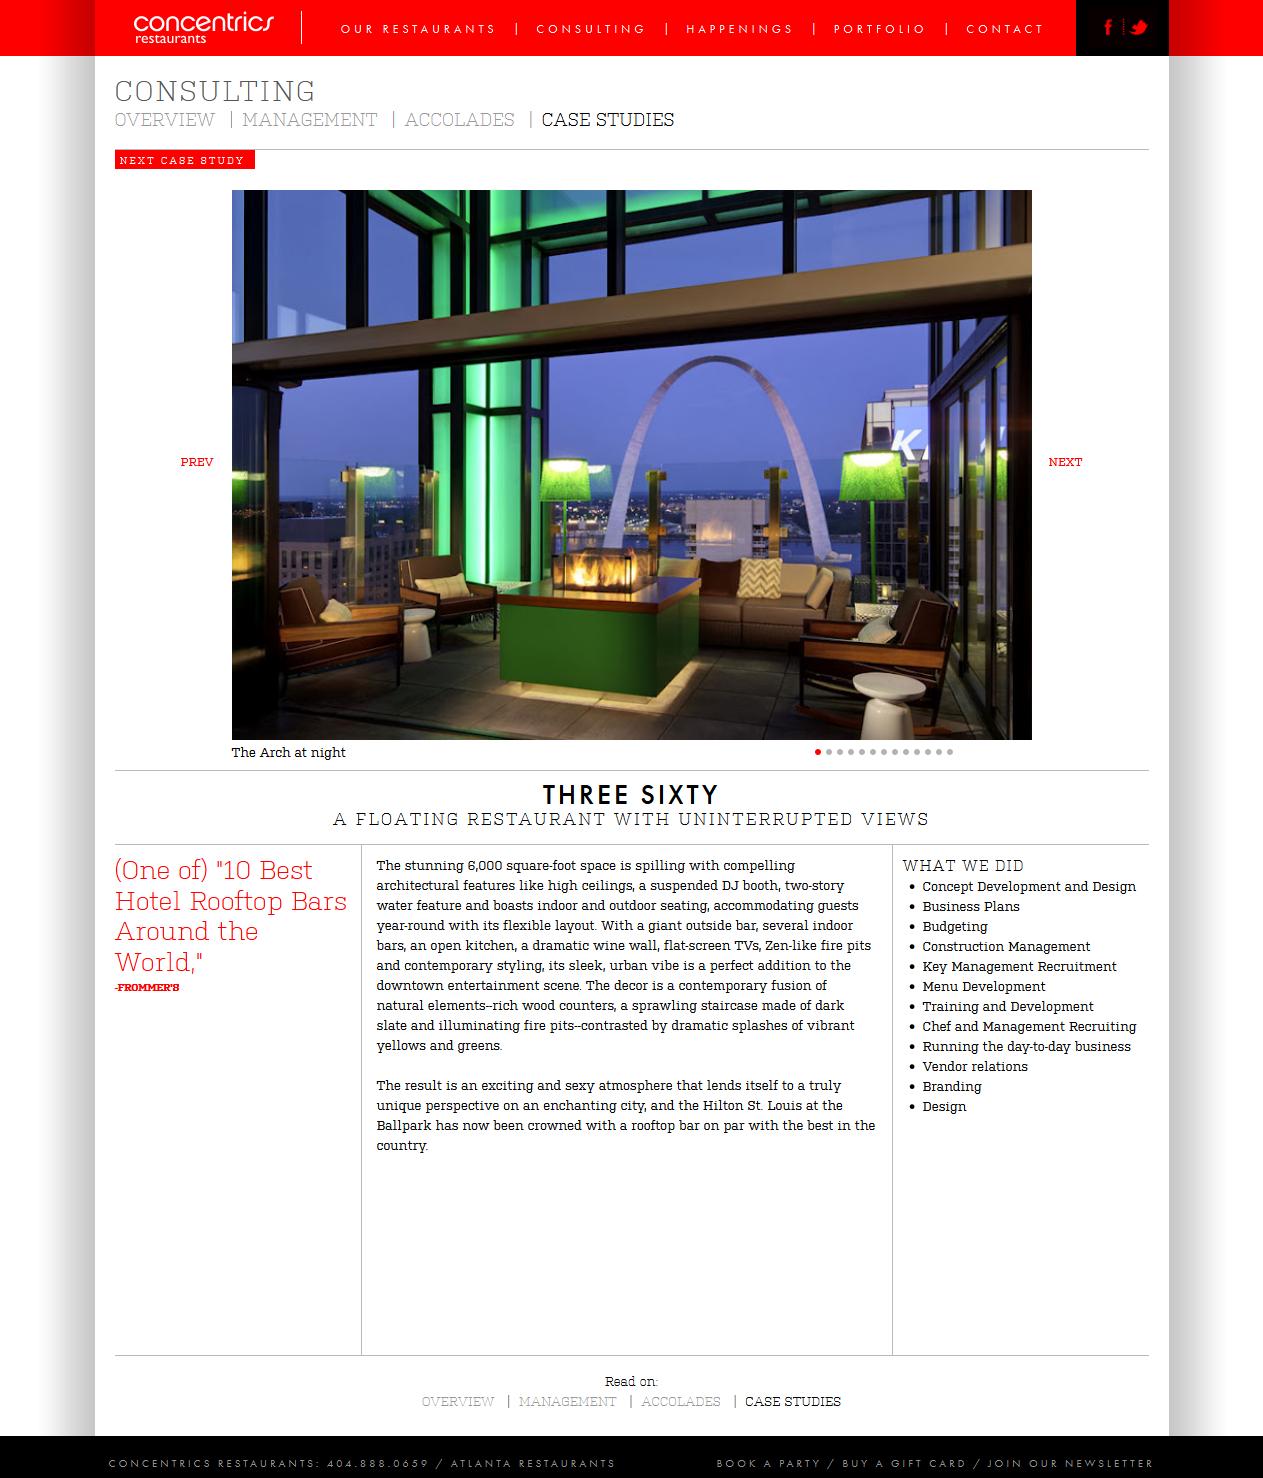 megabytes restaurant case study